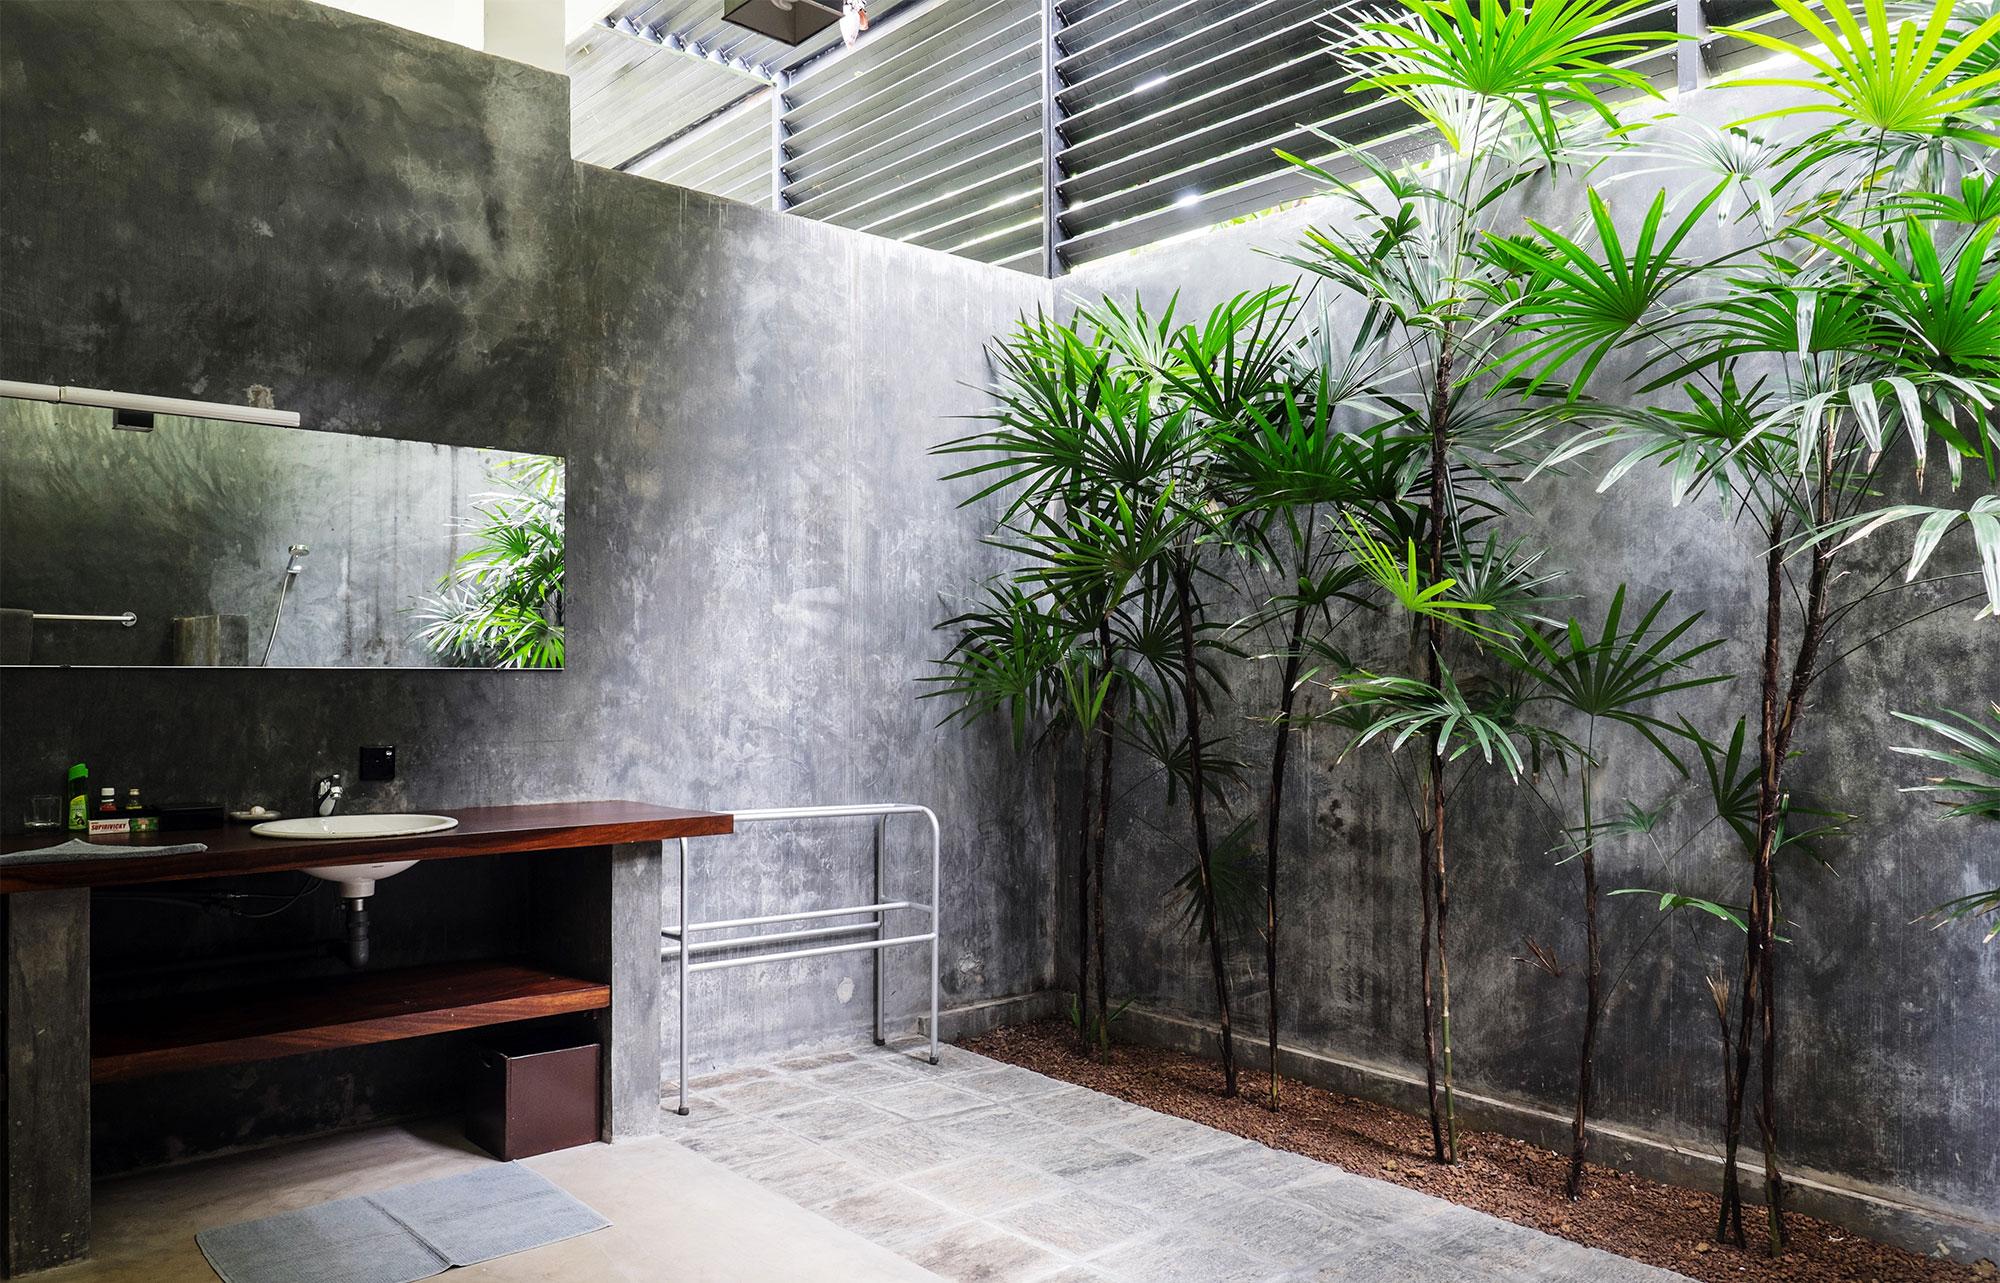 Badezimmer im Araliya Bungalow im Ayurveda Resort der one world foundation in Ahungalla, Sri Lanka, Foto: Andrea Alessandri